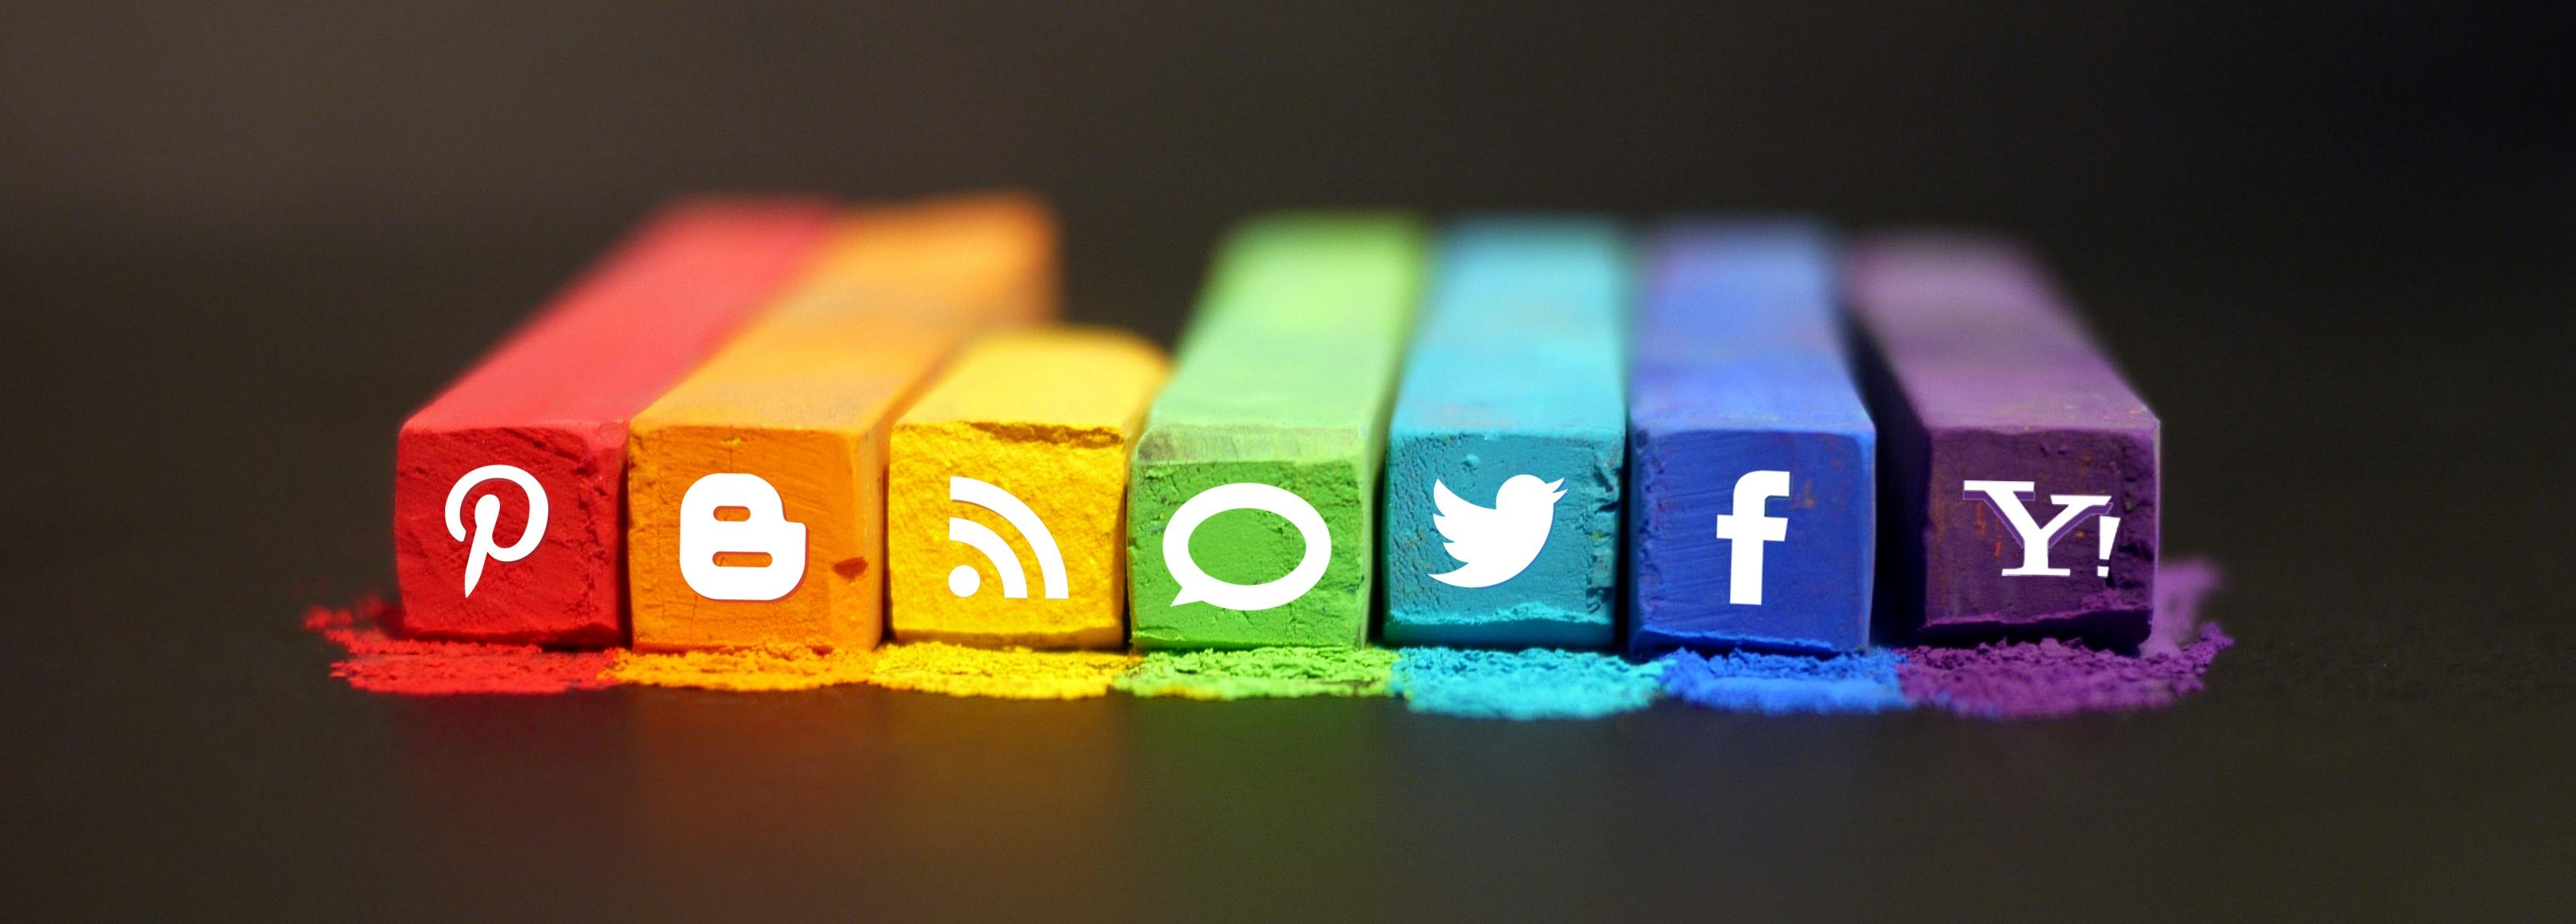 Checklist: Social Media for Business & Effective Online Marketing